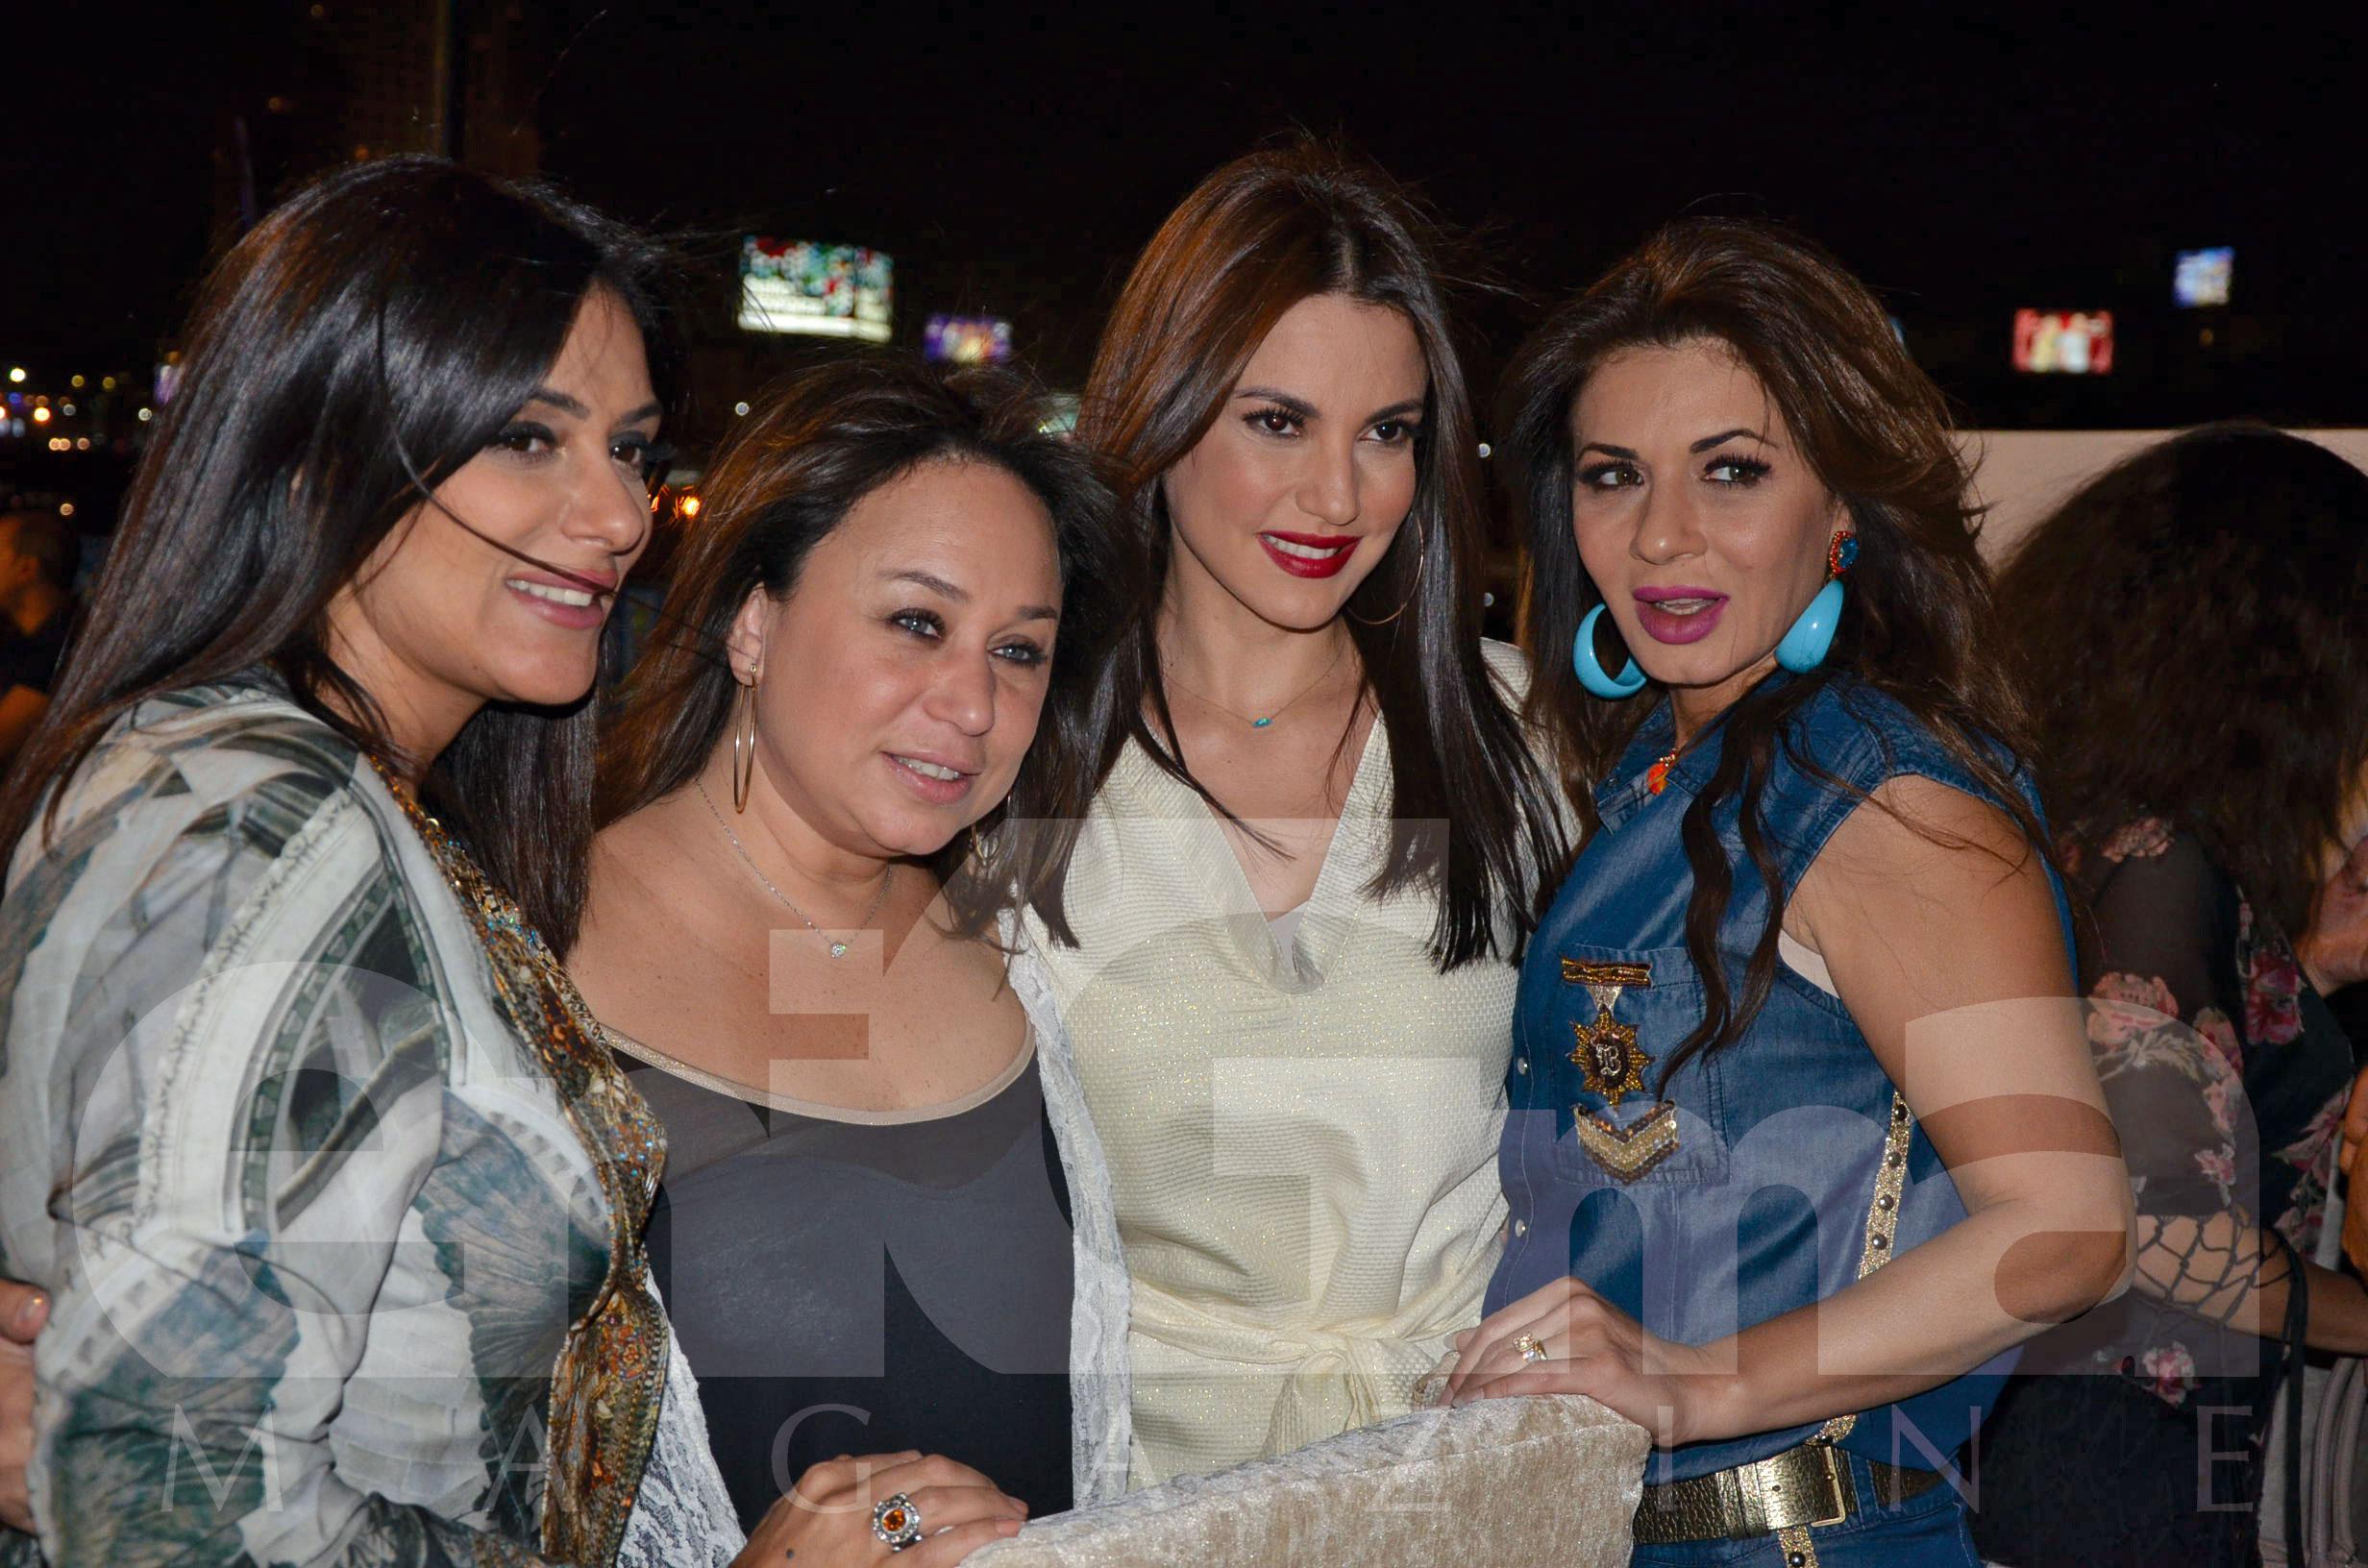 Ms.-Injie-El-Mokadem,-Ms.-Injie-Ali,-Ms.-Dorra-&-Ms.-Naglaa-Badr